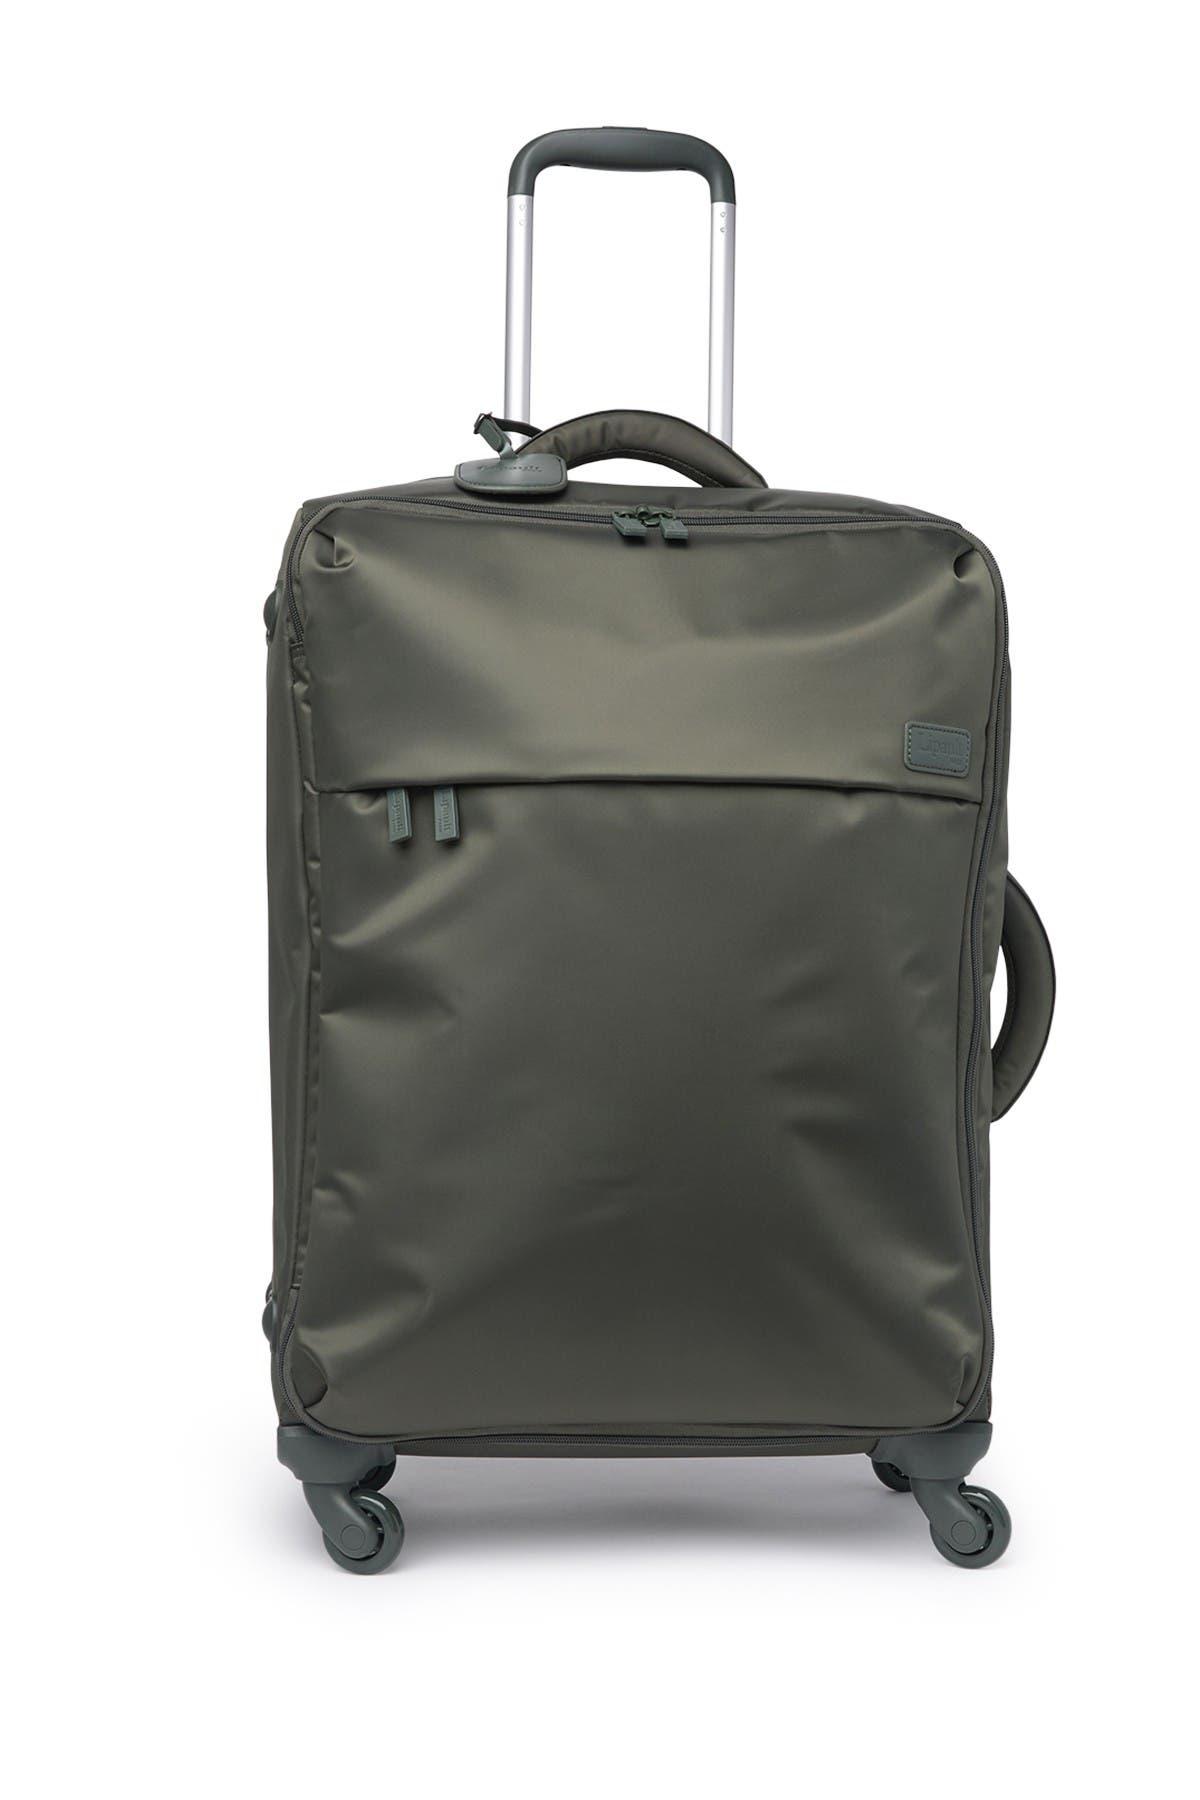 Image of Lipault 65/24 4-Wheel Spinner Luggage